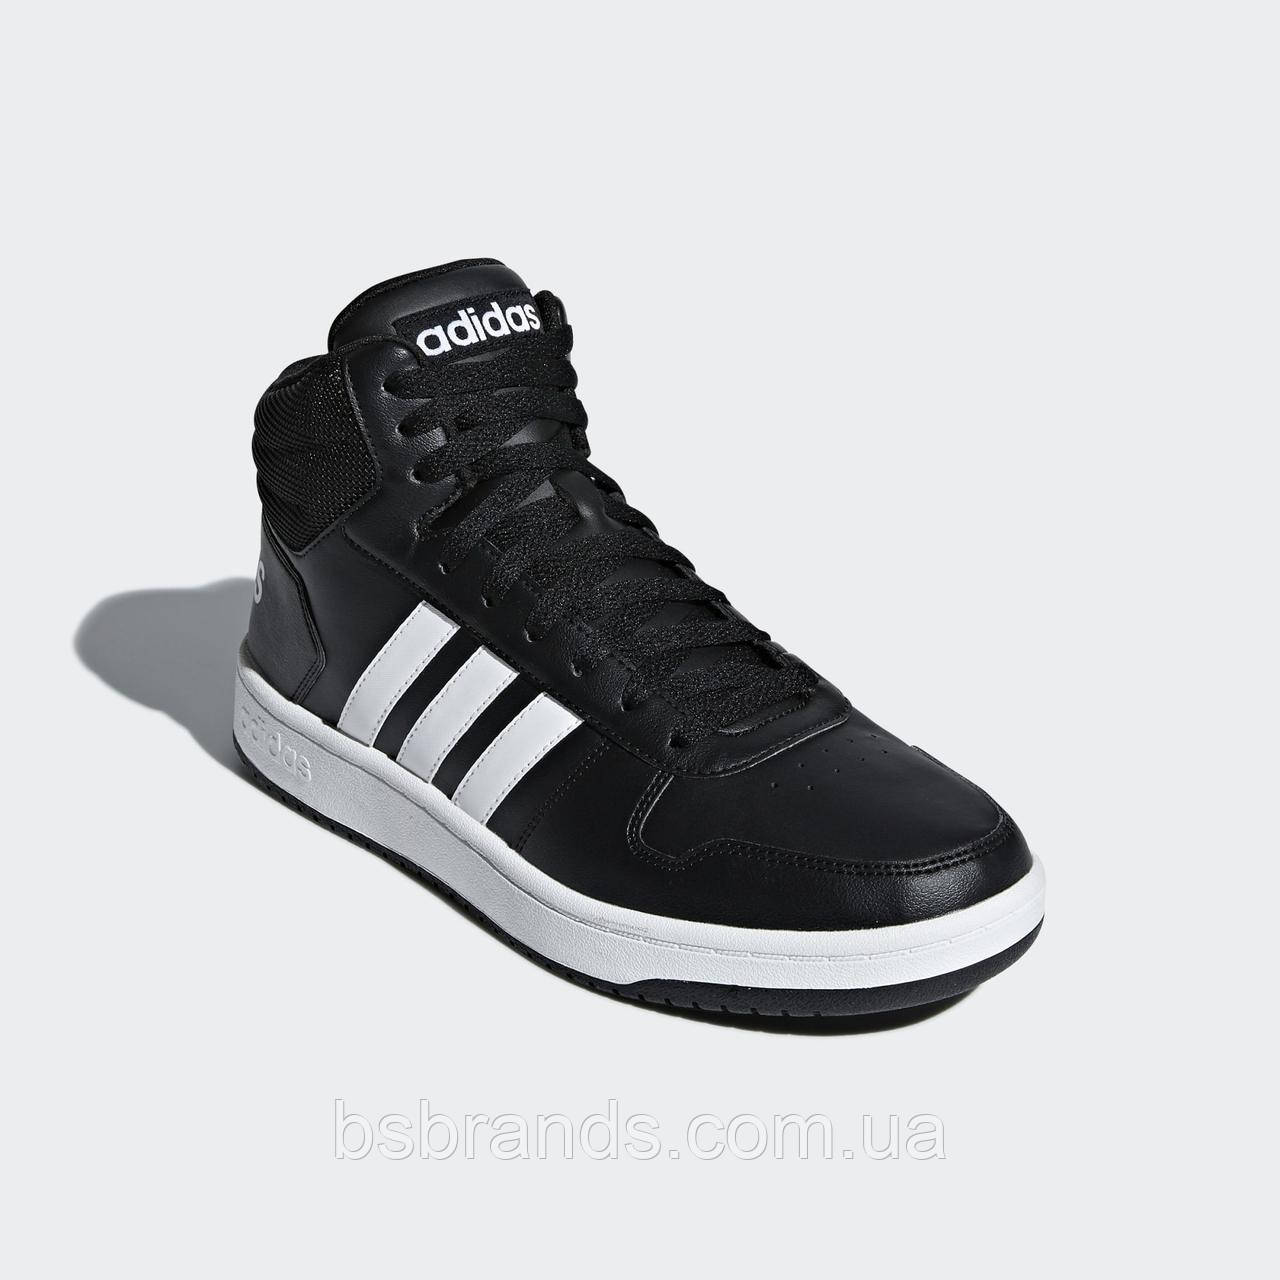 Мужские кроссовки adidas VS Hoops Mid 2.0 BB7207